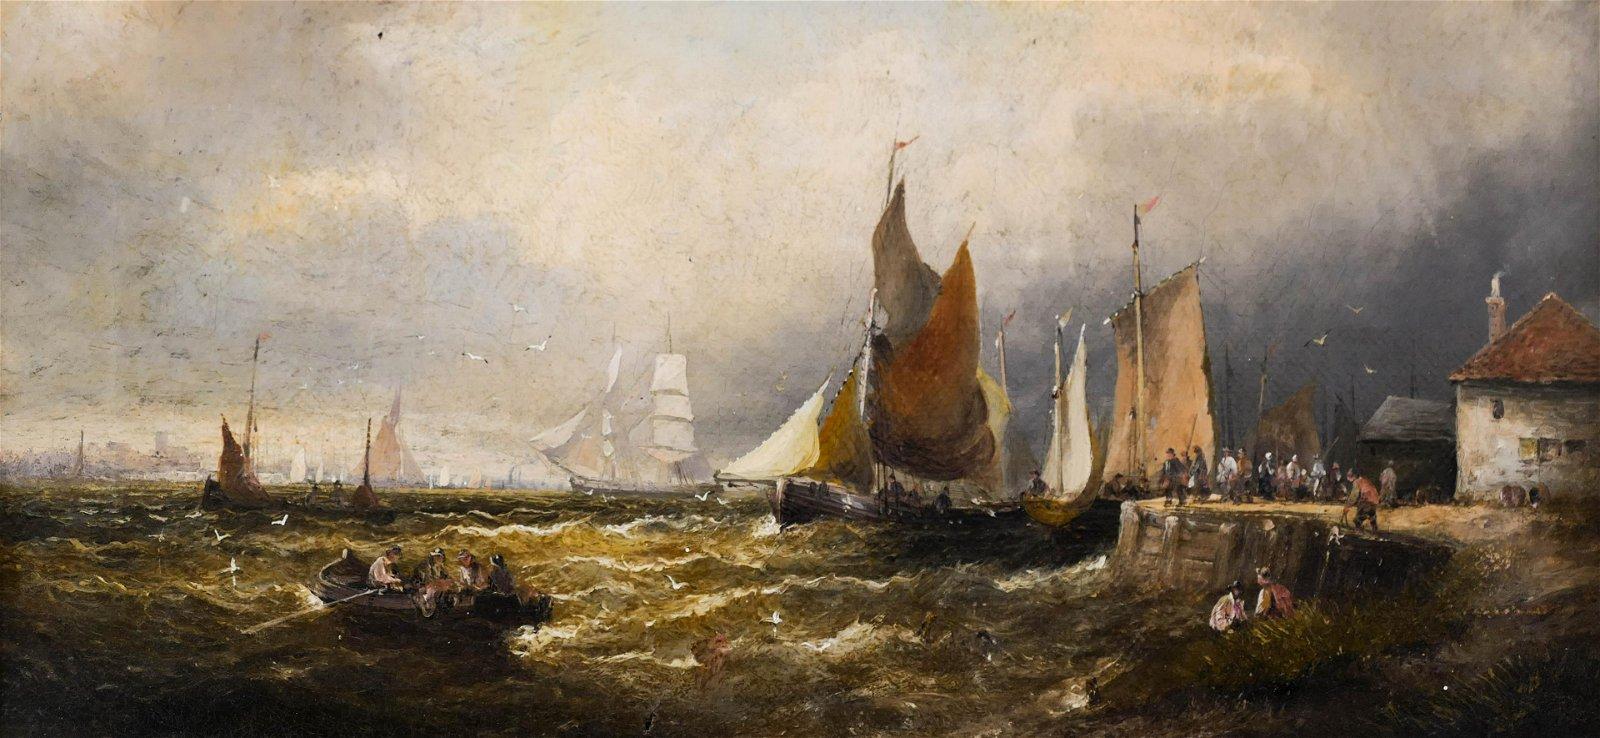 Attributed to George Balmer (1806-1846 British)